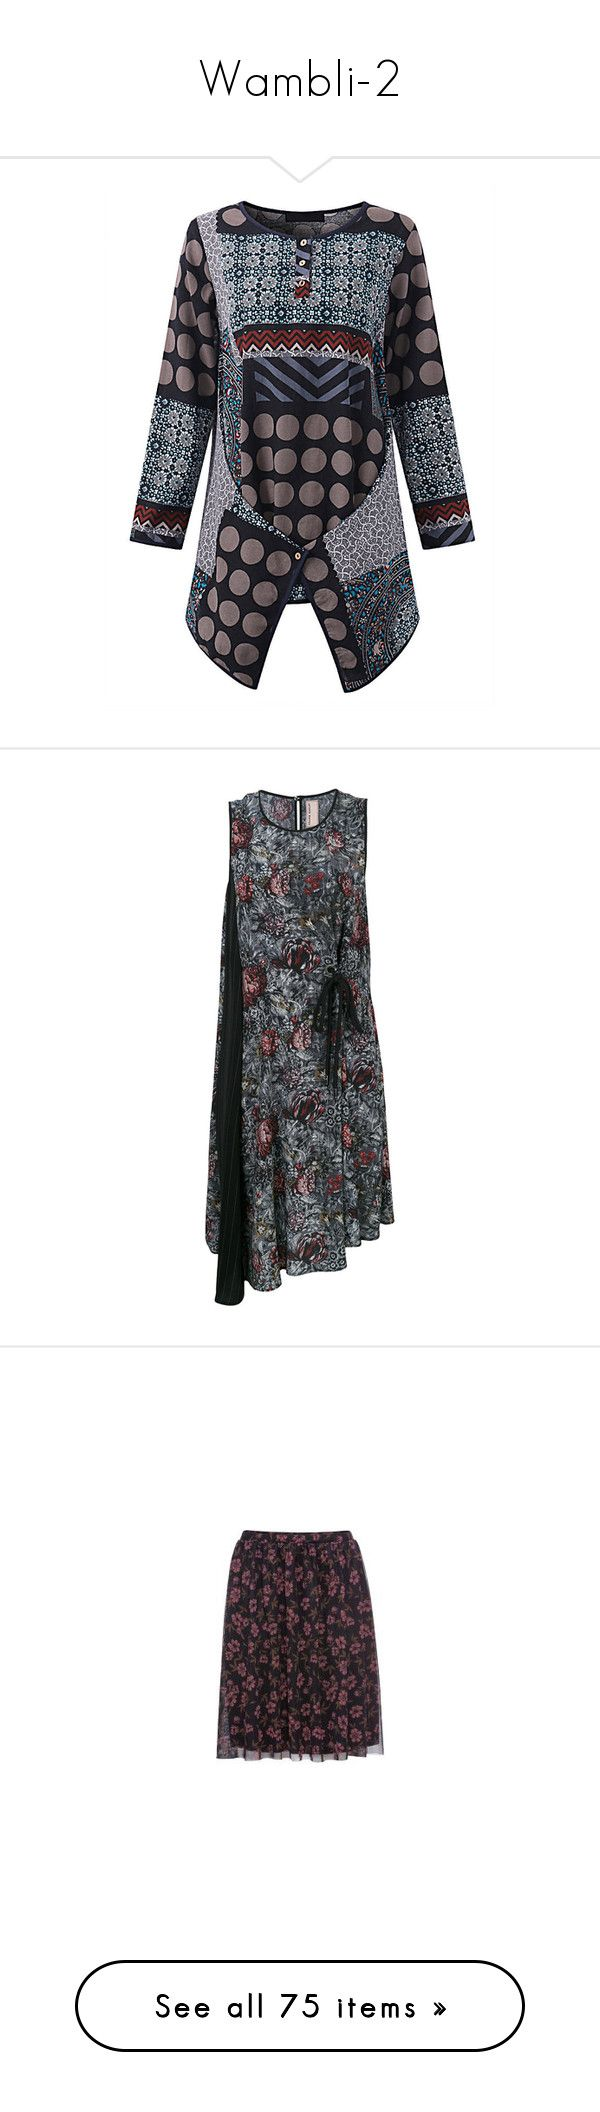 """Wambli-2"" by lorika-borika on Polyvore featuring tops, vintage tops, vintage print shirt, vintage patterned shirts, sleeved shirt, long-sleeve shirt, dresses, multicolour, drawstring waist dress и multi coloured dress"